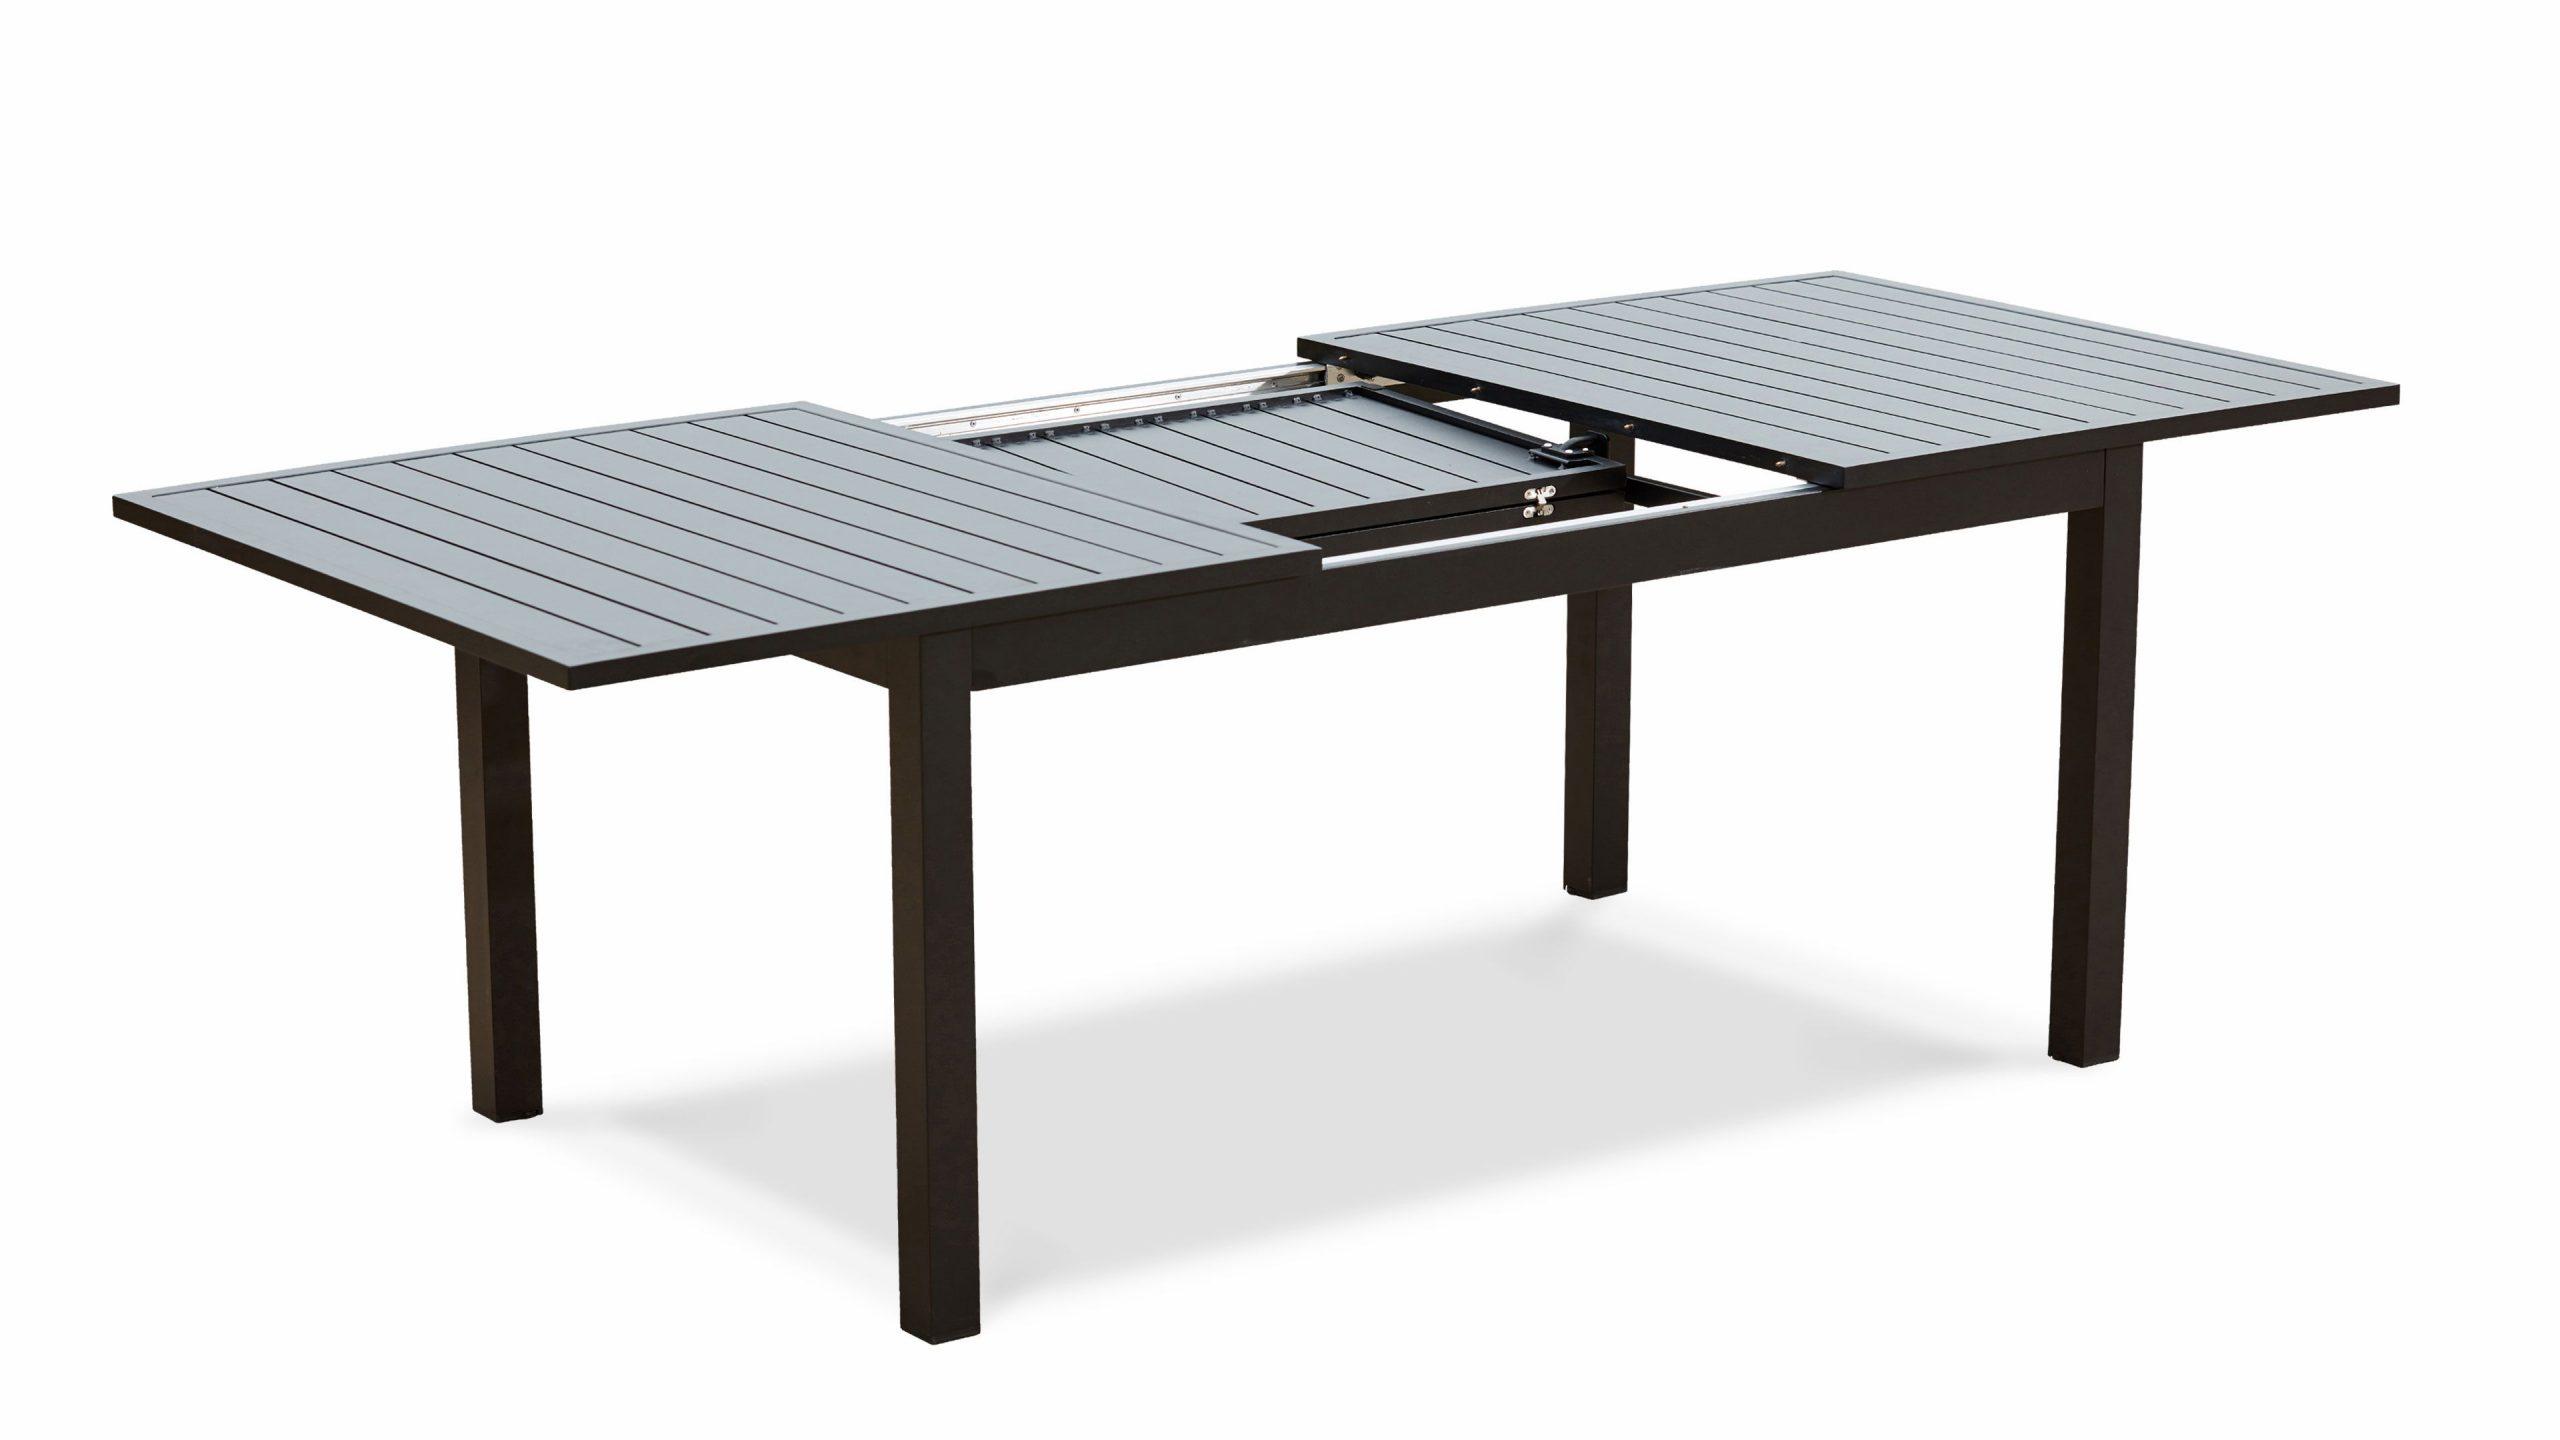 Table Jardin Extensible Rallonge 174/238 Cm Aluminium pour Table Jardin Cdiscount